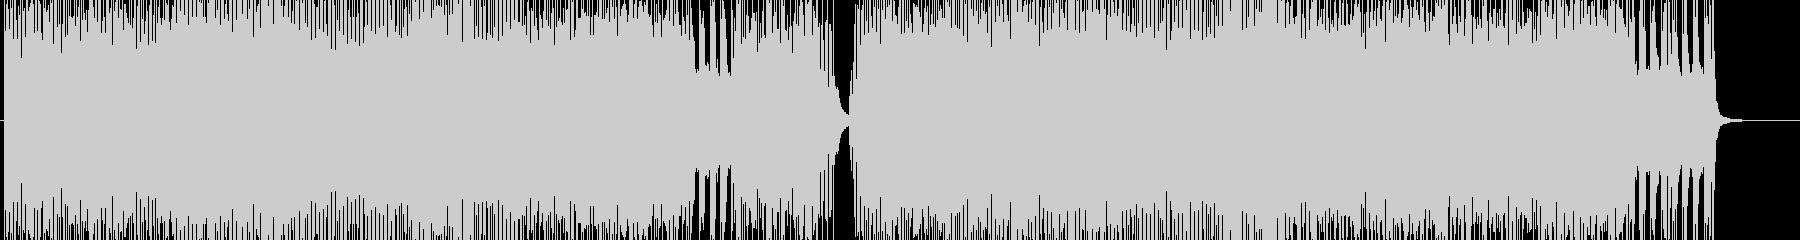 HARDROCK、DRAK ROCKの未再生の波形